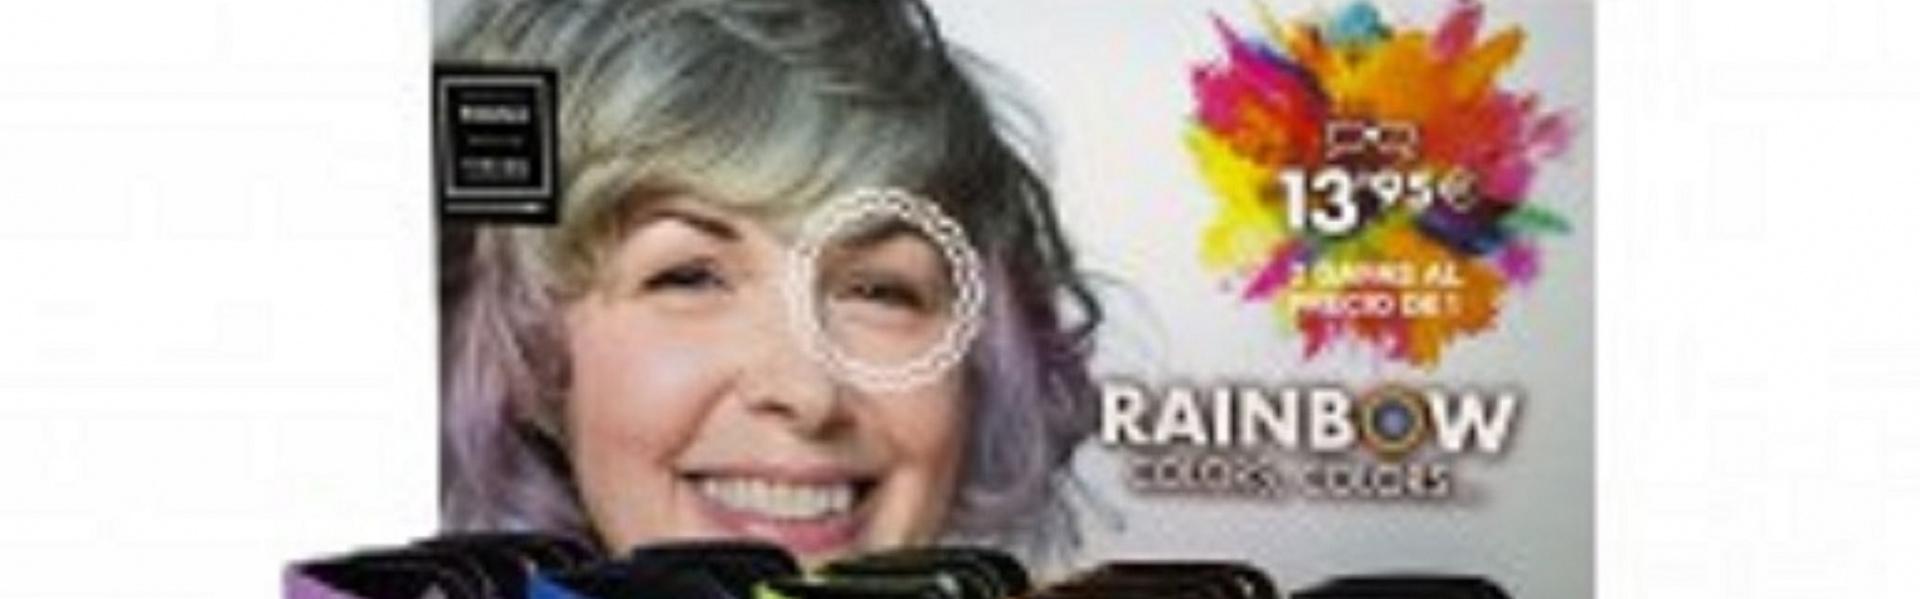 GAFAS RAINBOW 2X1 A 13.95€